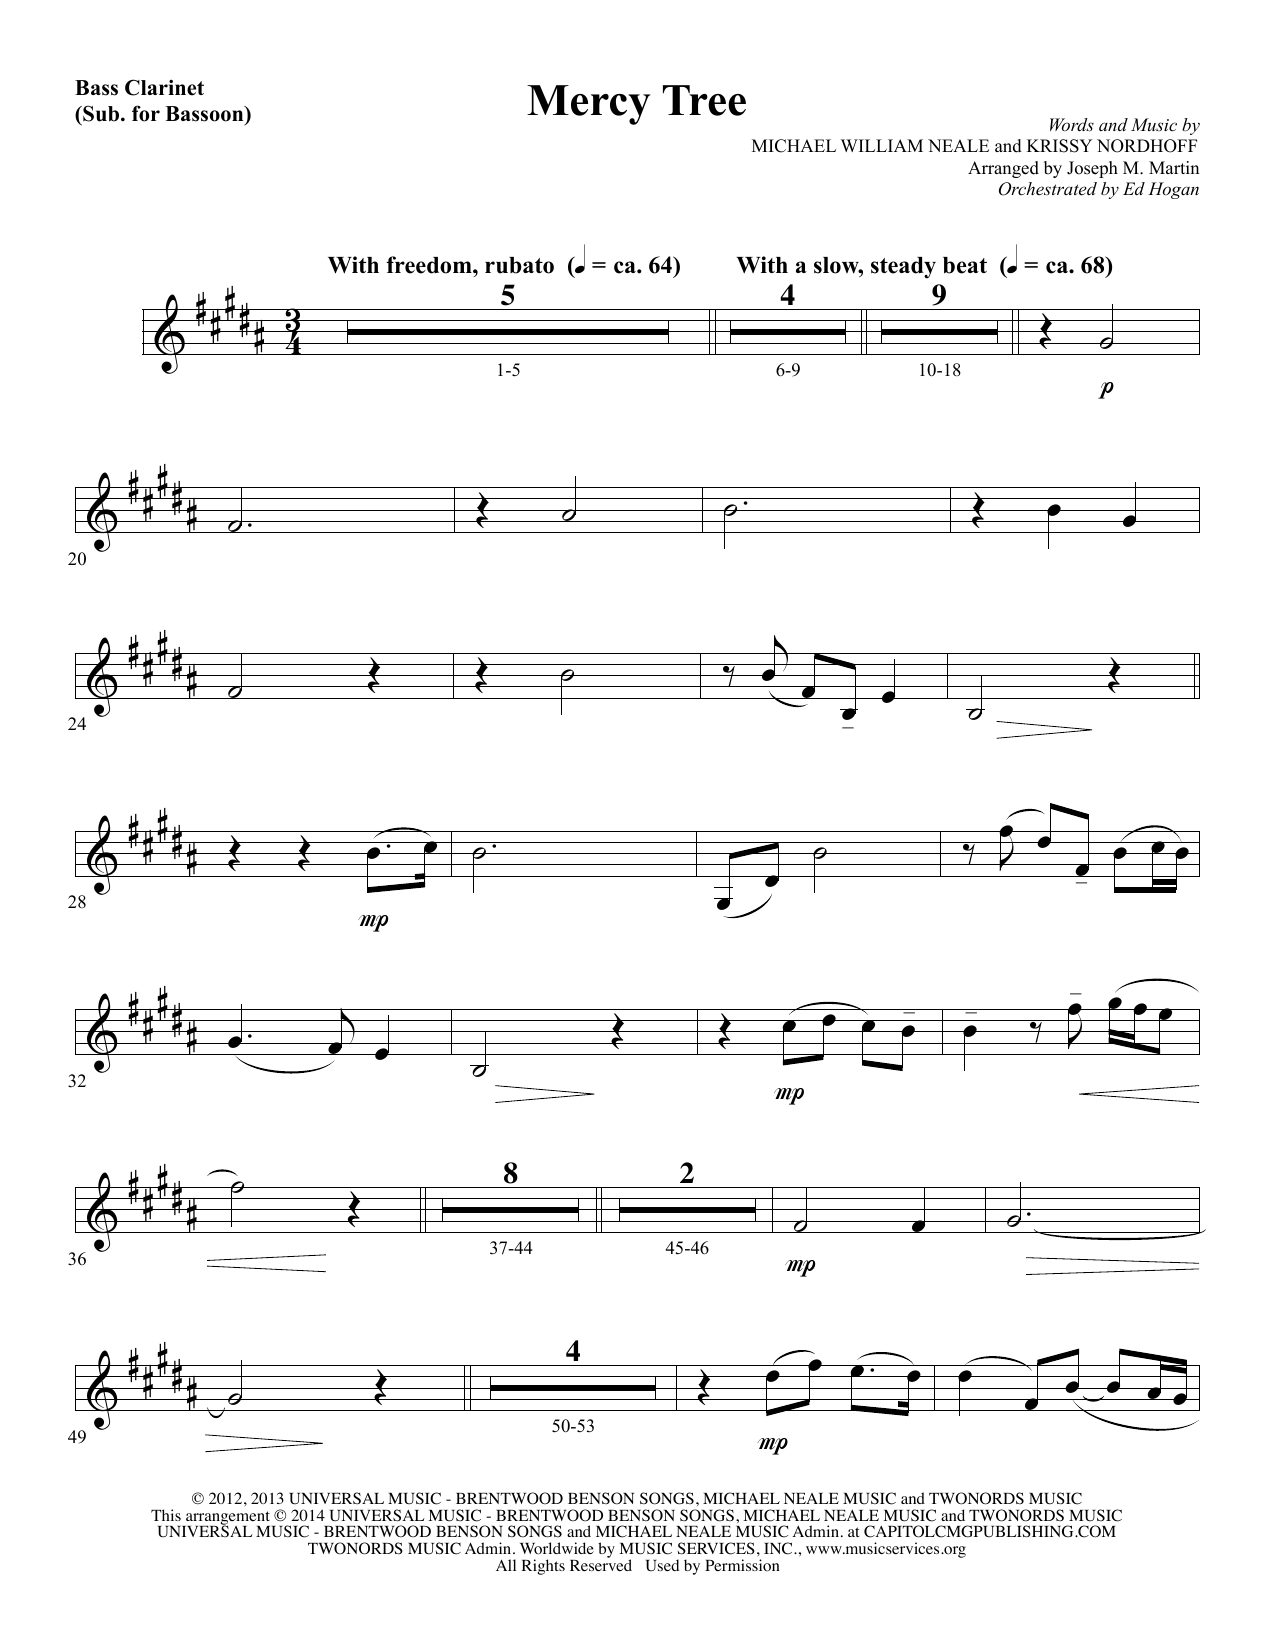 Mercy Tree - Bass Clarinet (sub. Bassoon) Sheet Music